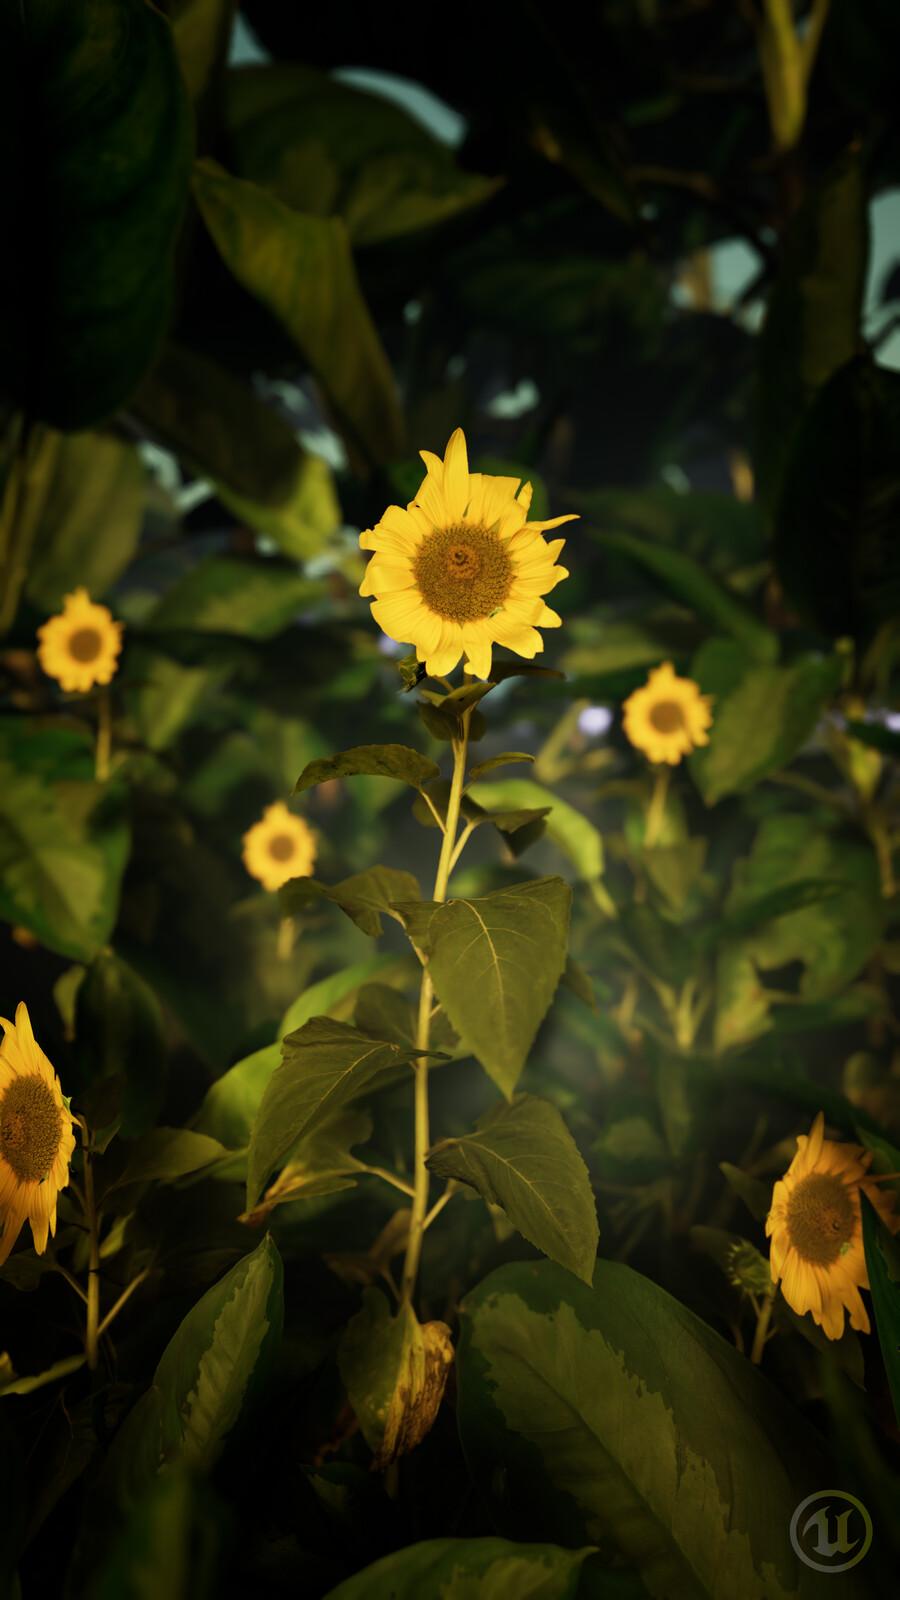 The Sunflowers in Garden